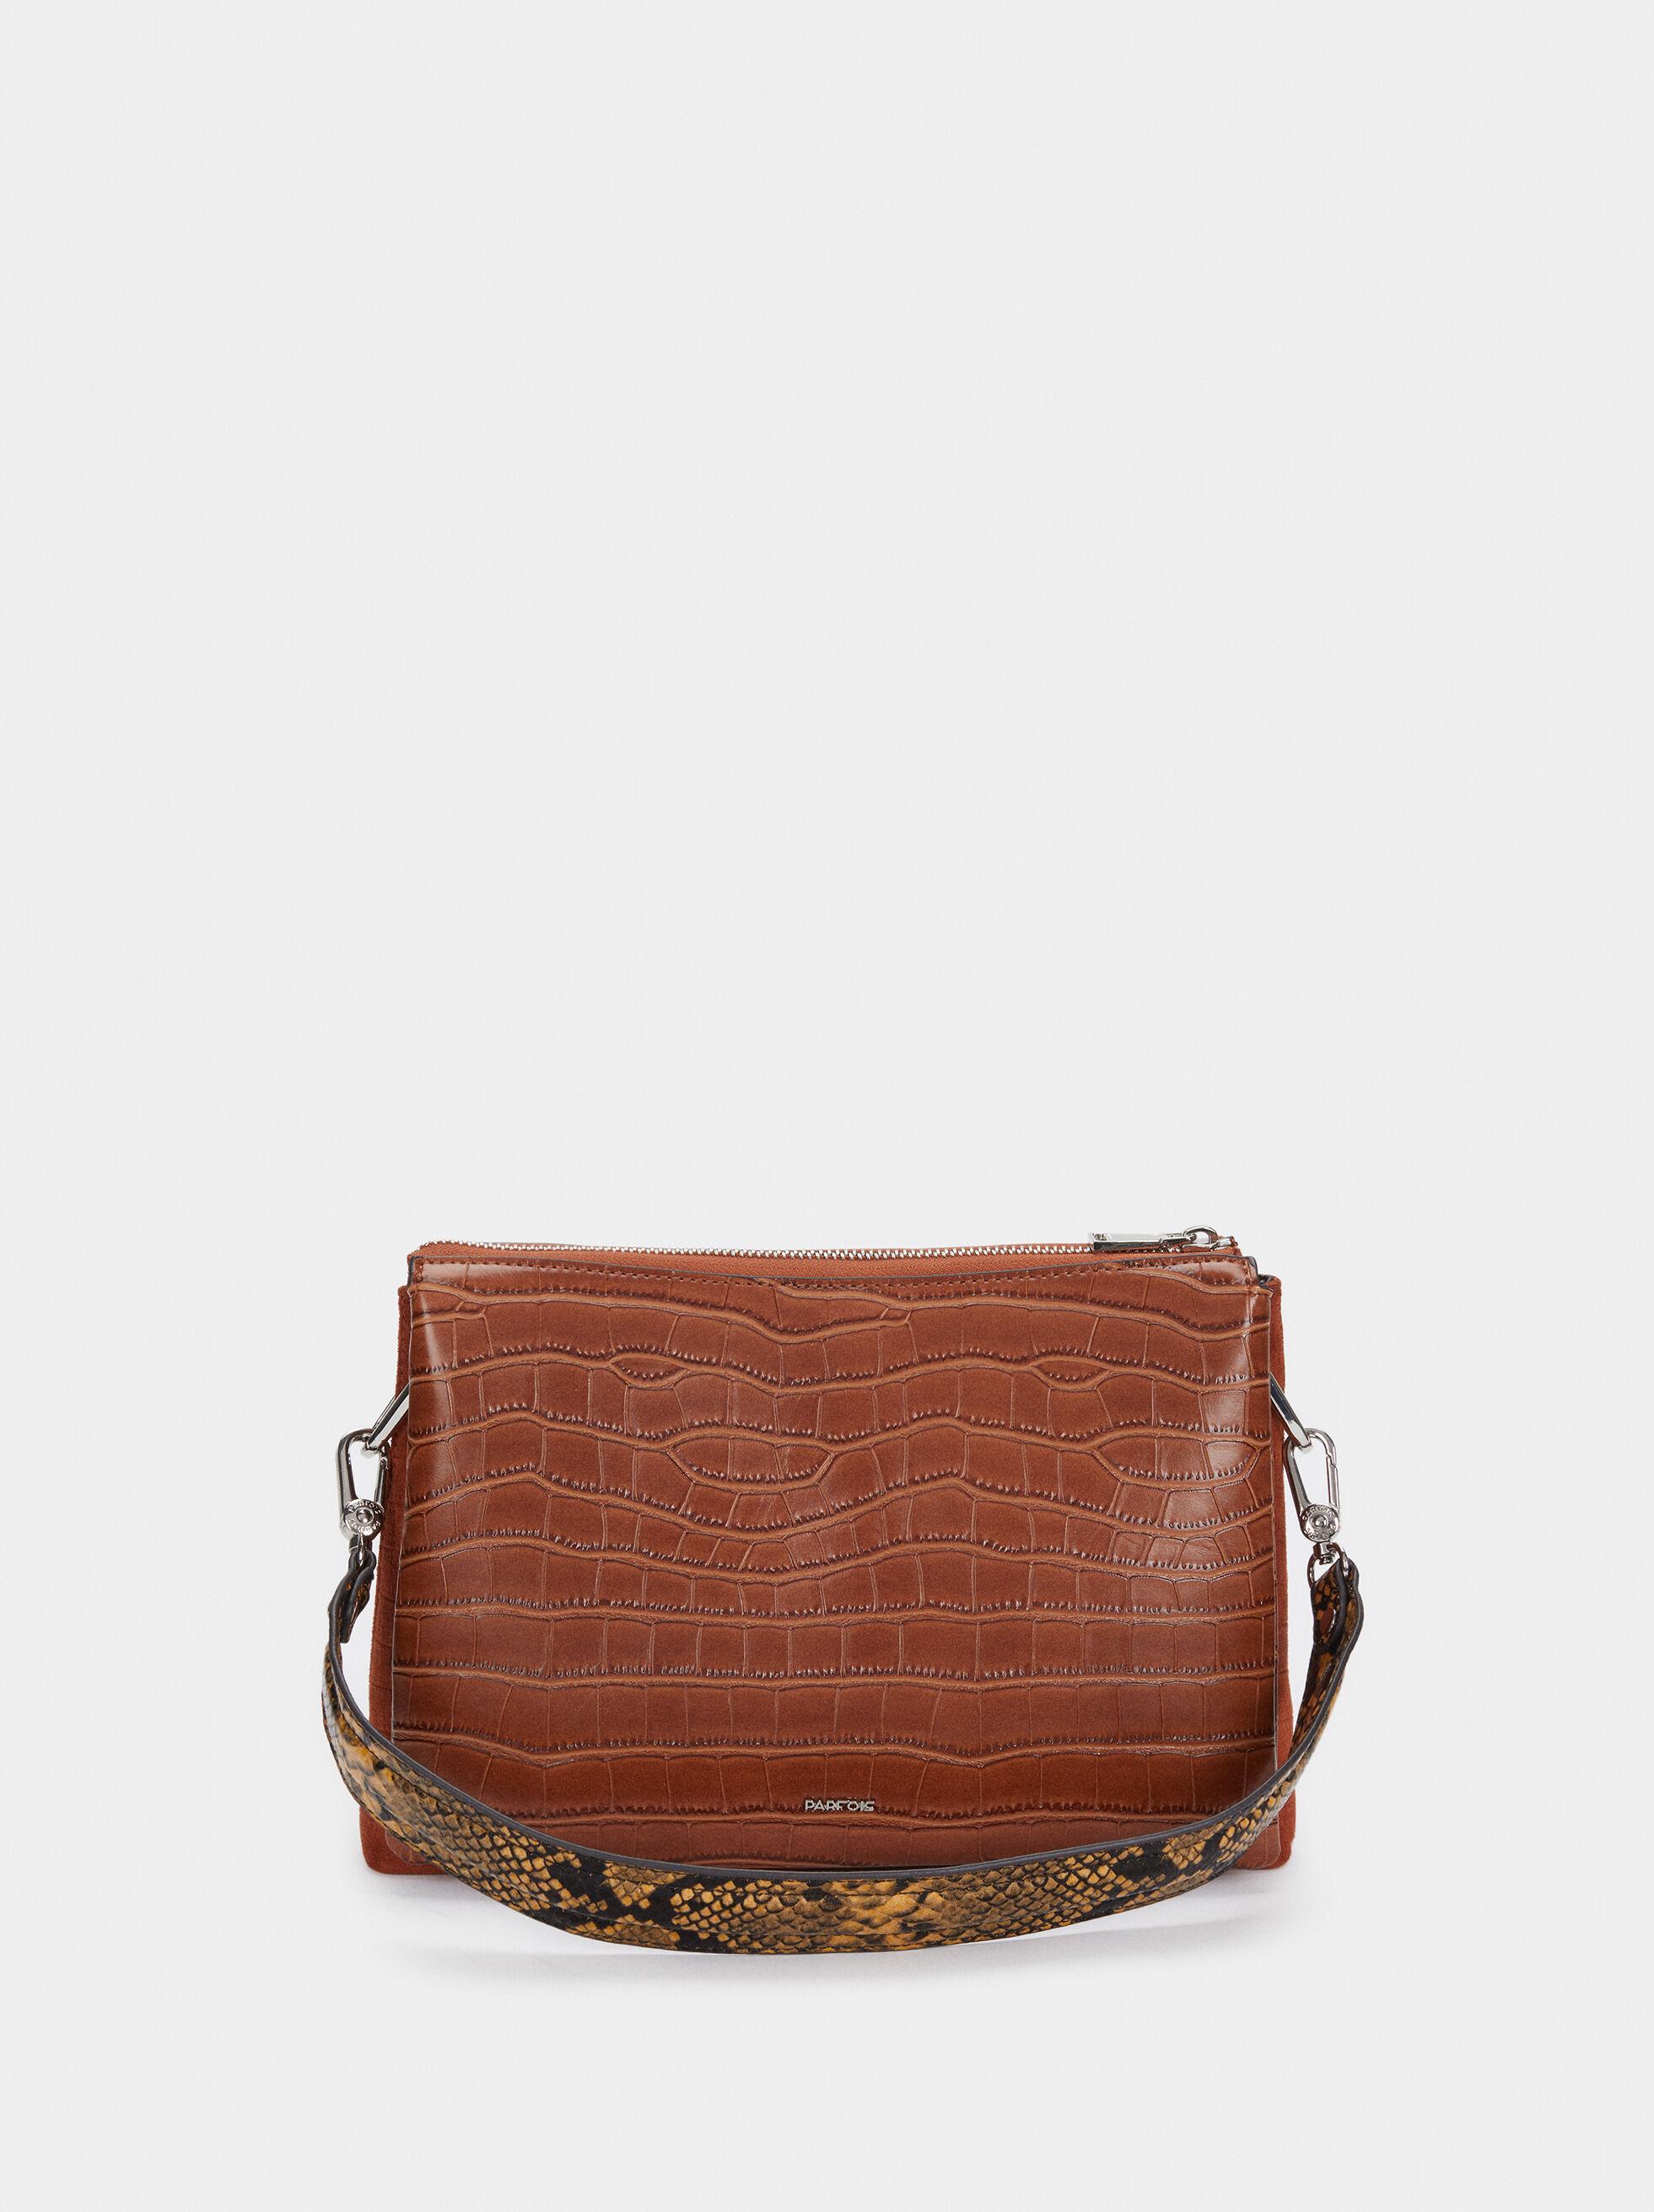 Crossbody Bag With Embossed Animal Print, Camel, hi-res